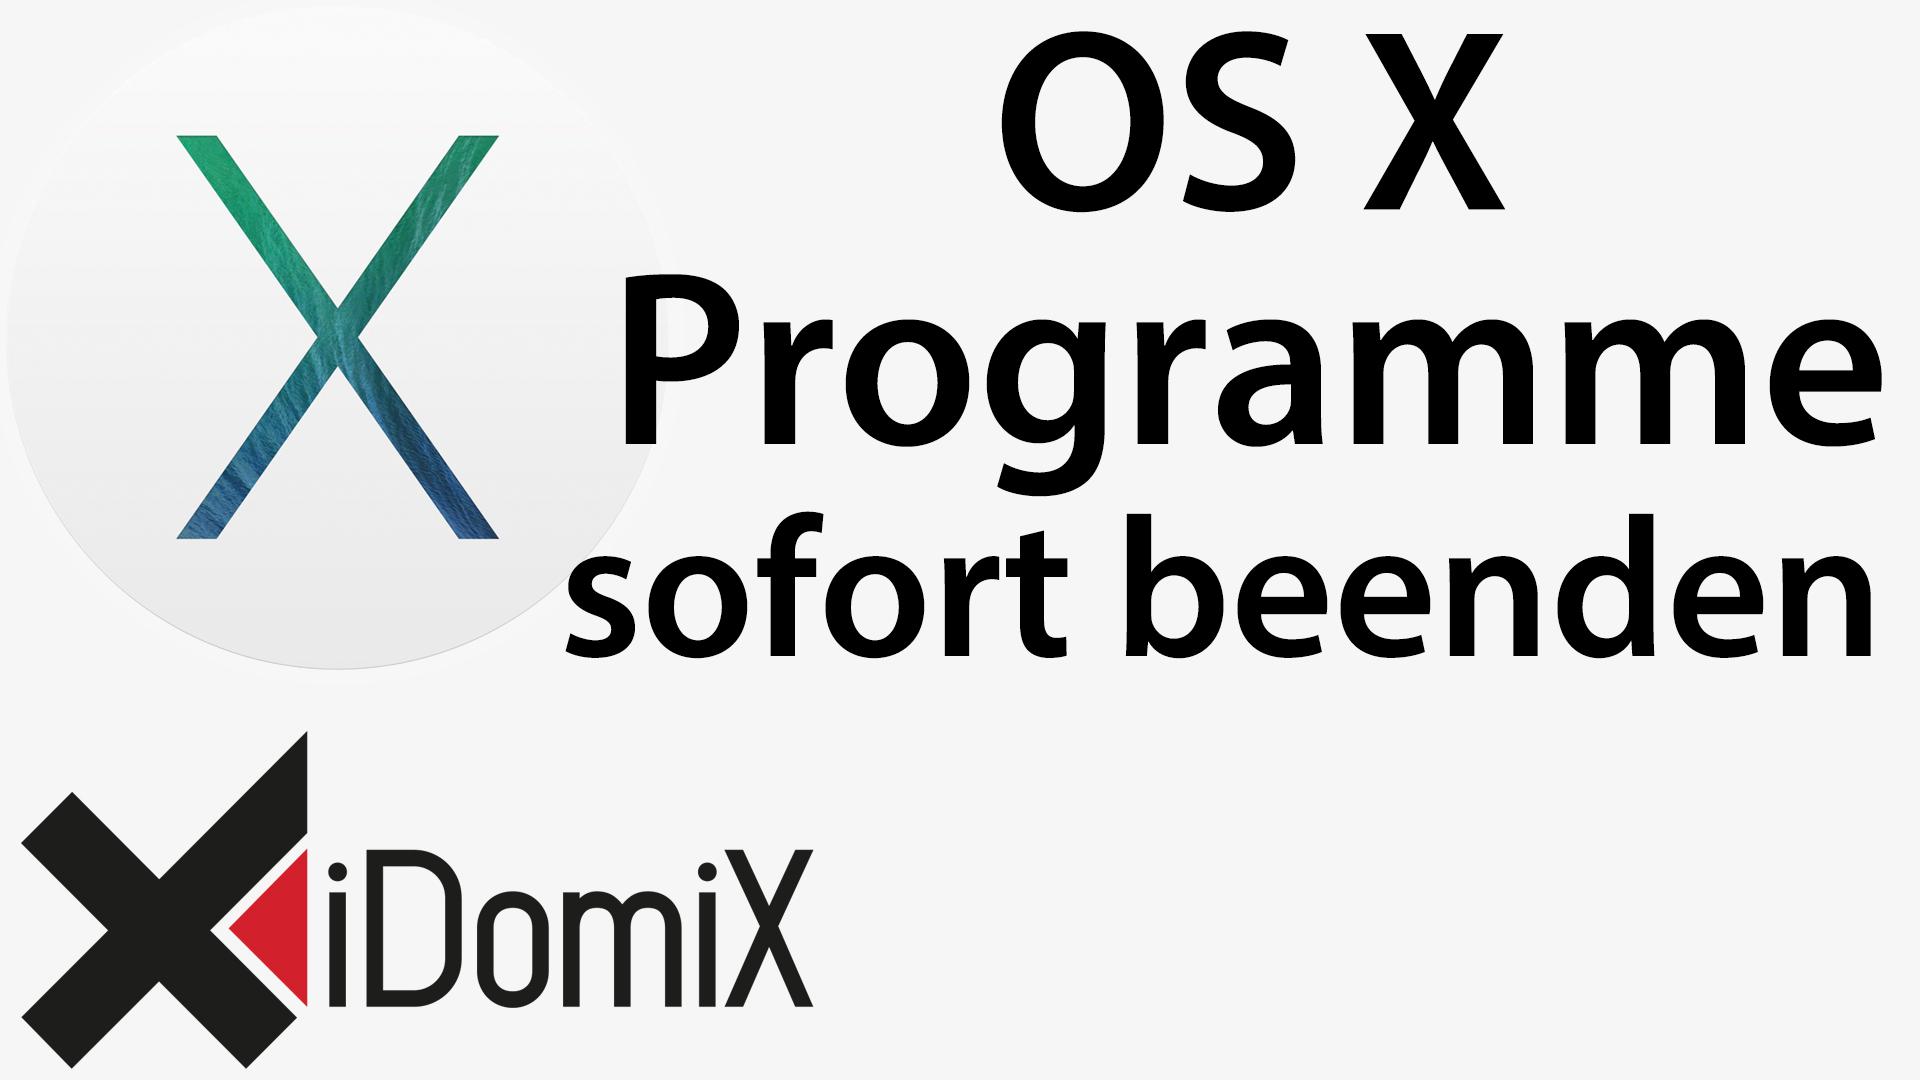 #245 OS X Programme sofort beenden